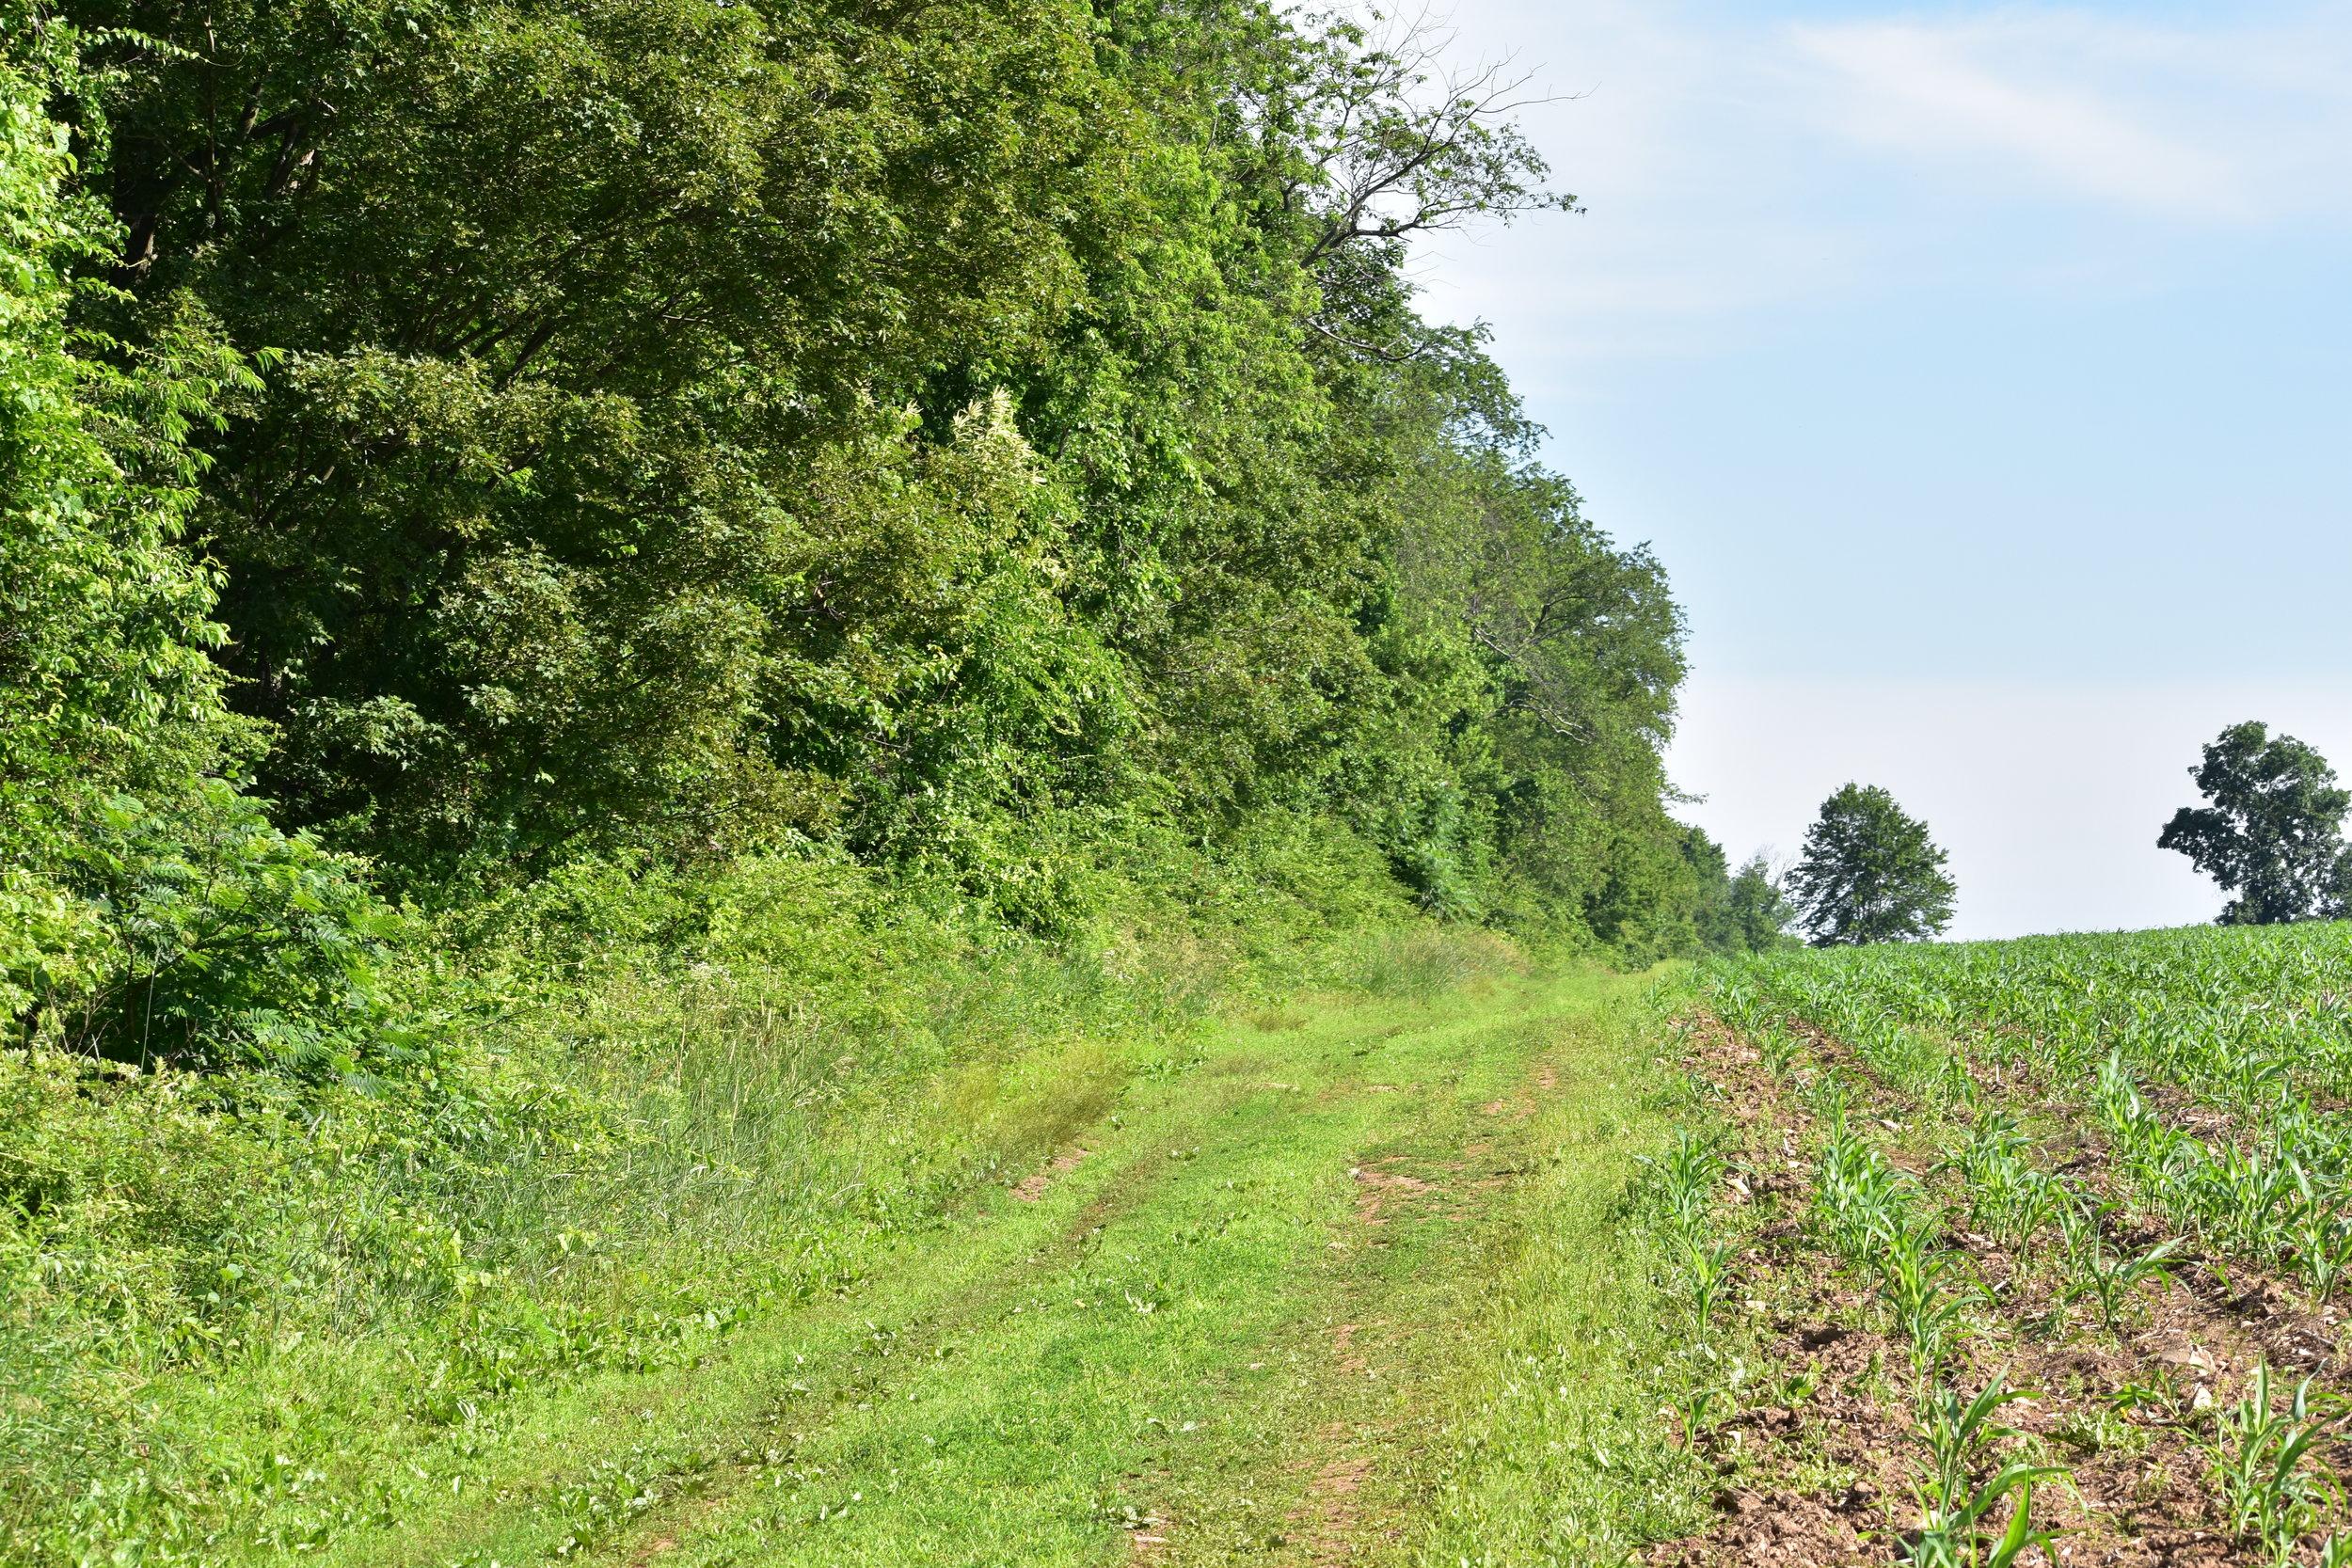 Habitat: Open Woodland Edge with tall deciduous trees